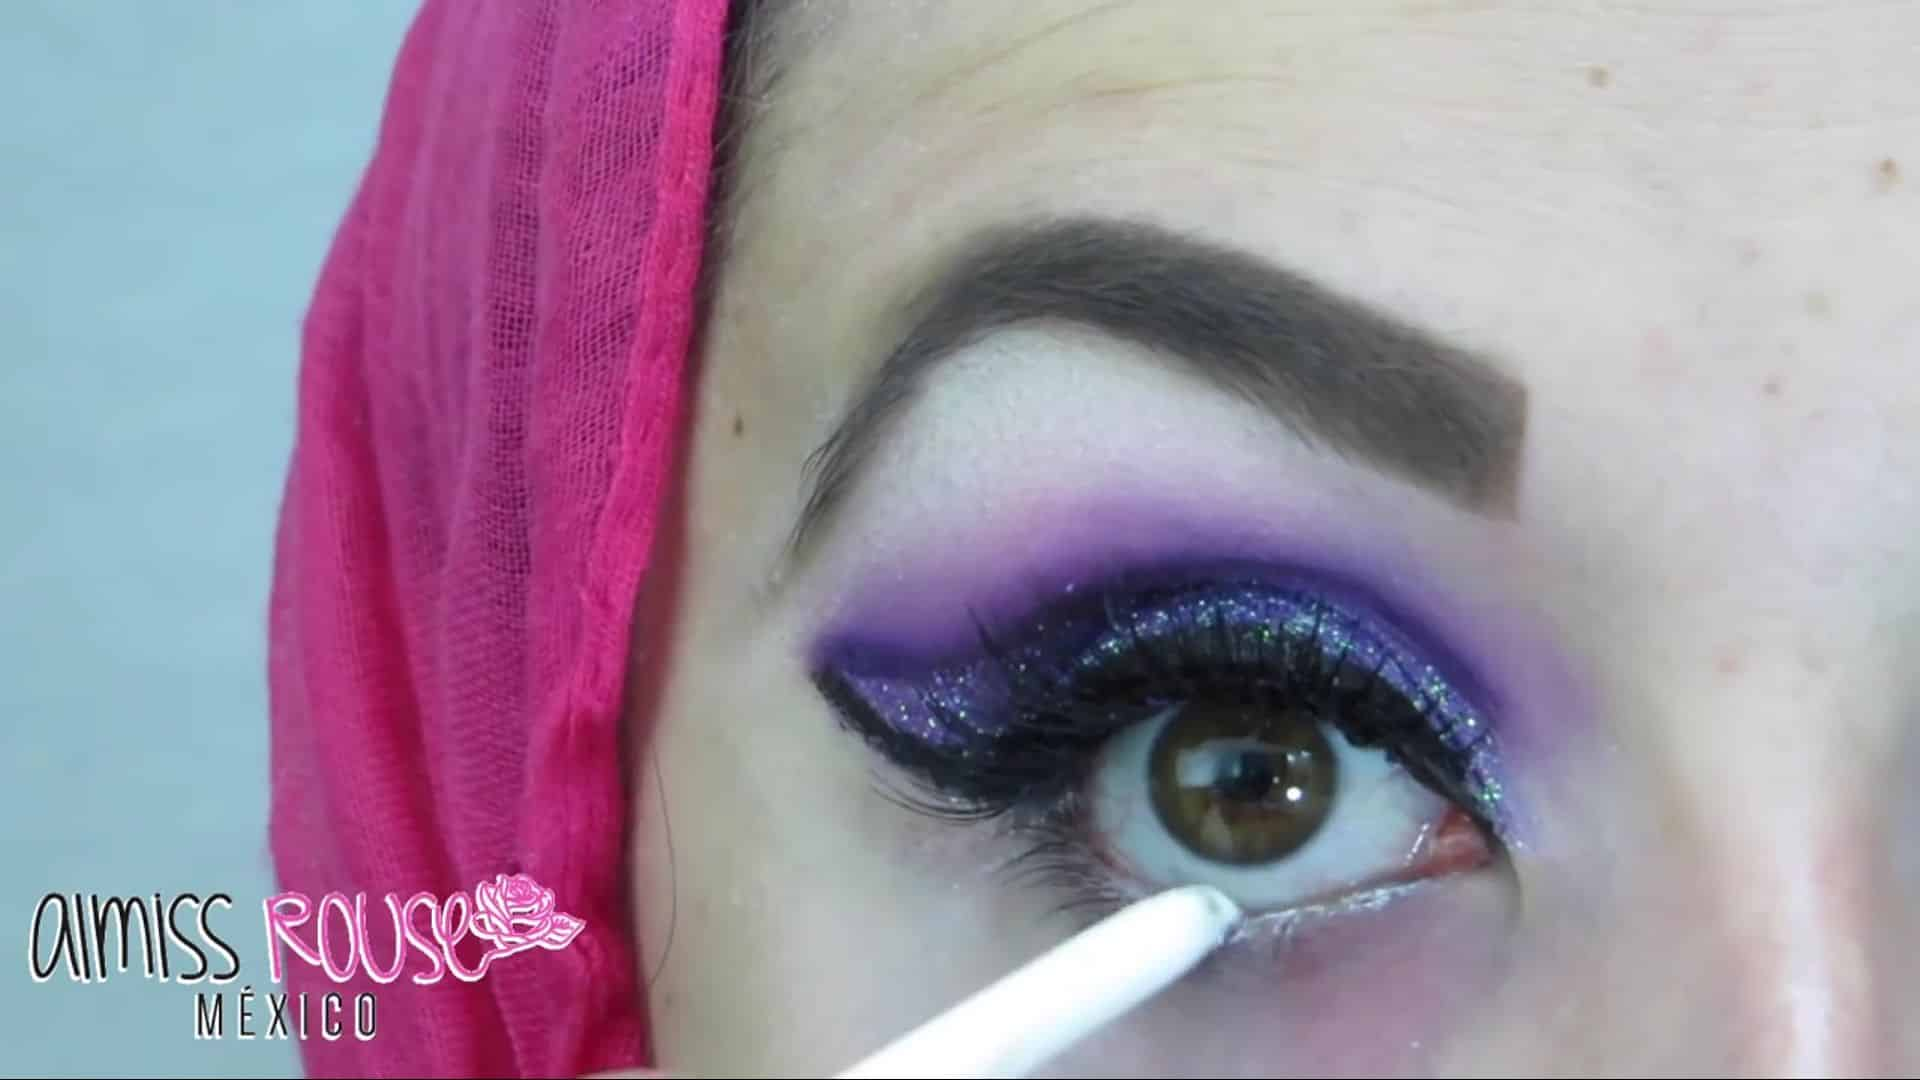 Paso a paso maquillaje Árabe almiss rouse 2020, delineado de linea de agua.